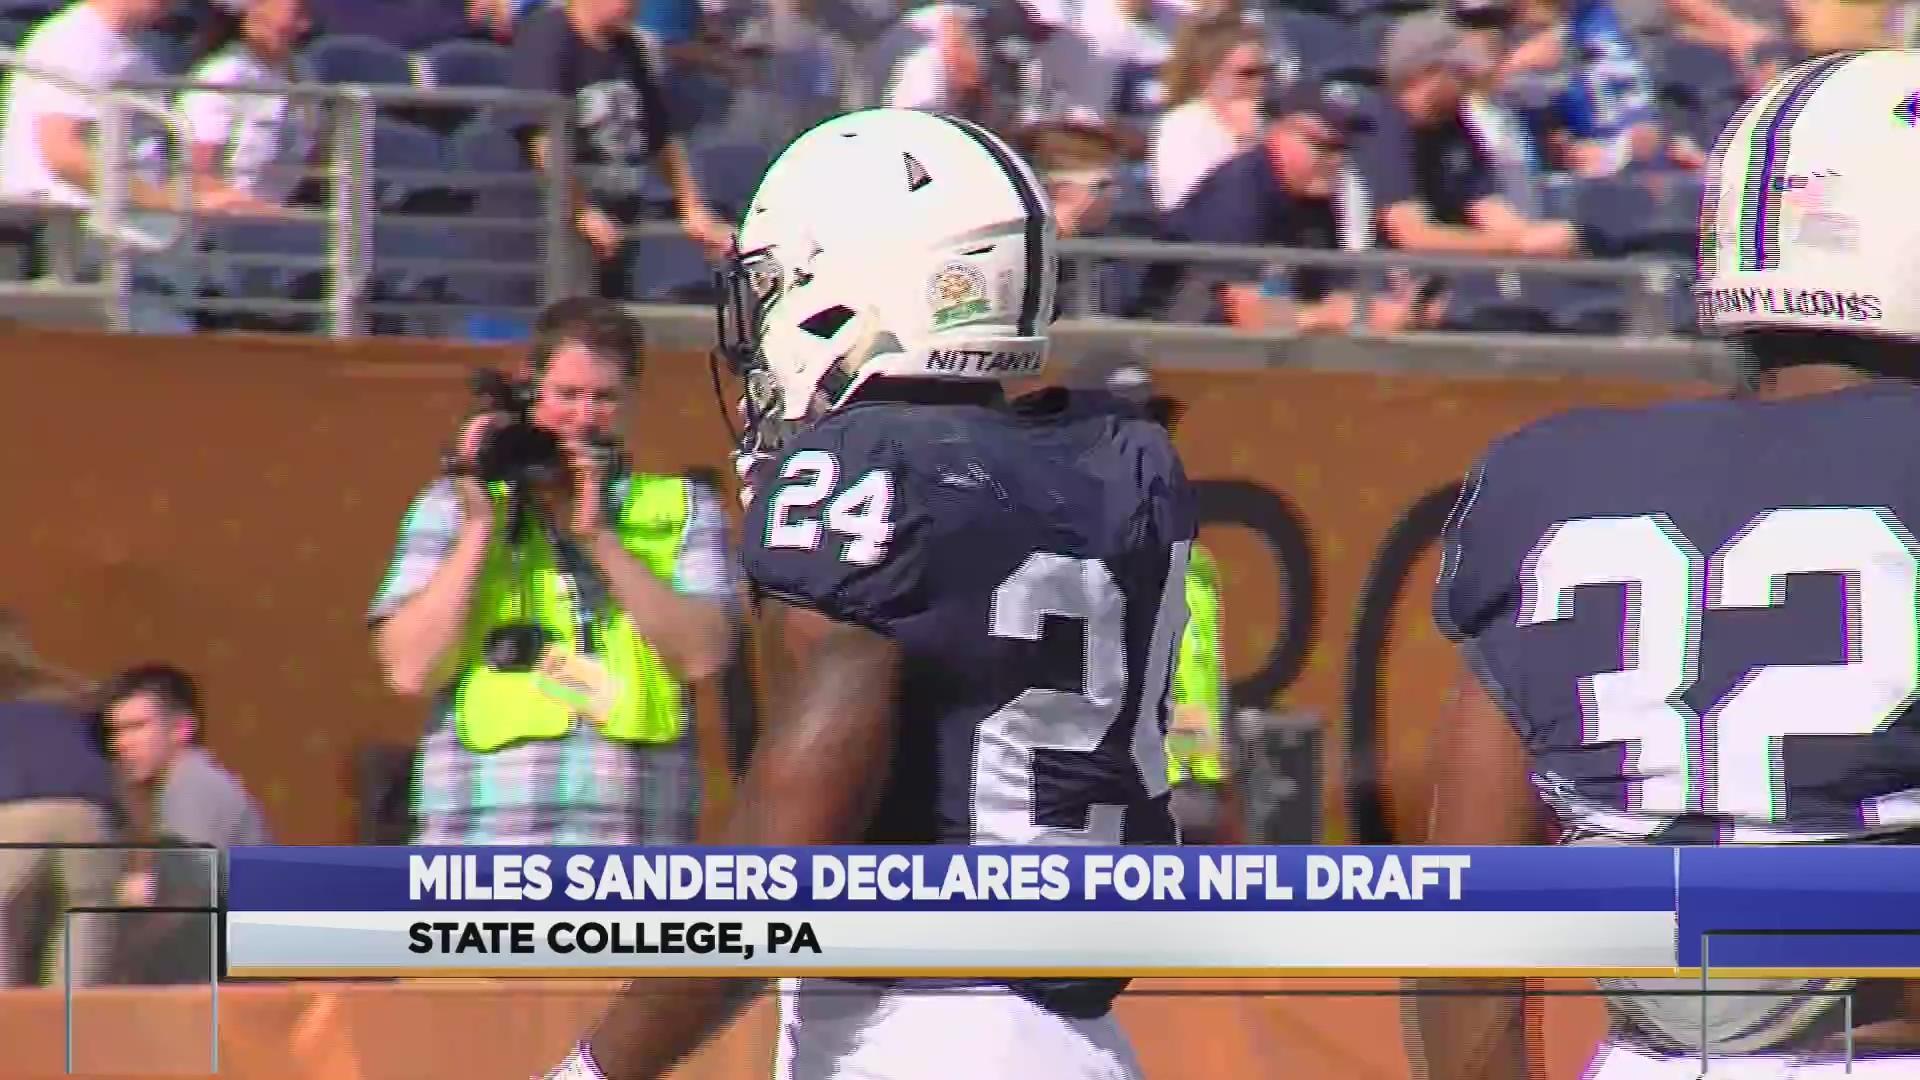 Sanders_declares_for_NFL_draft_0_20190104034002